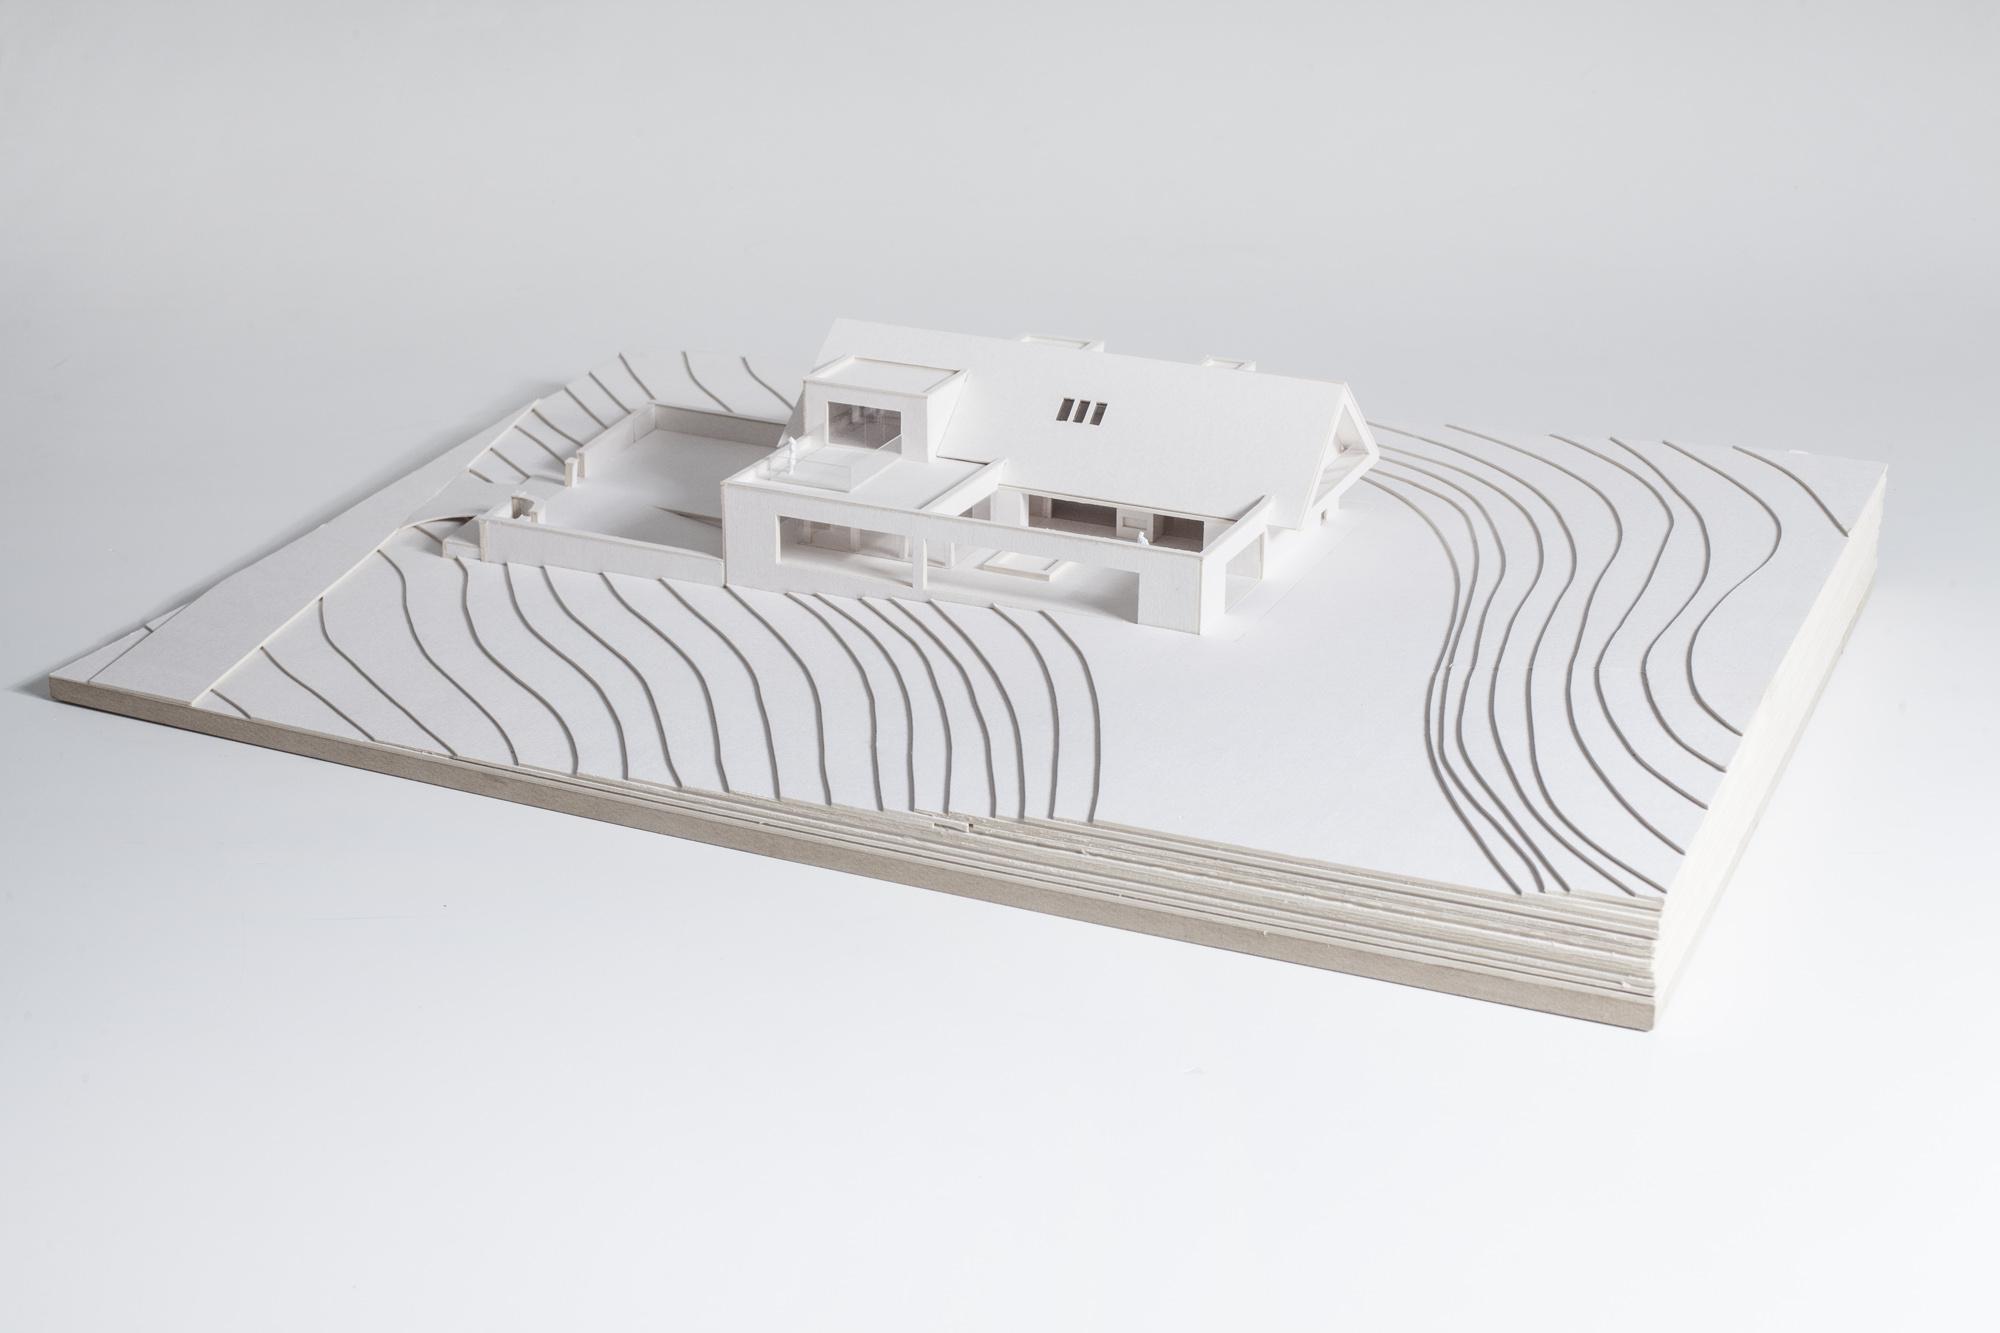 KRK-KOB-model-04